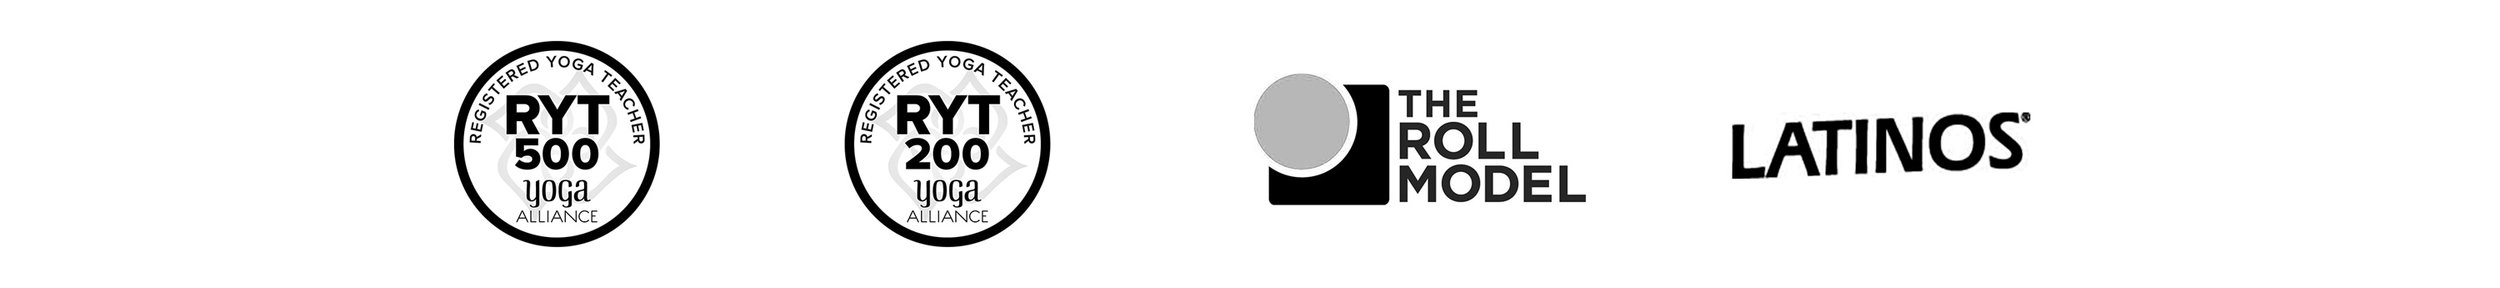 logot_horizontal.jpg